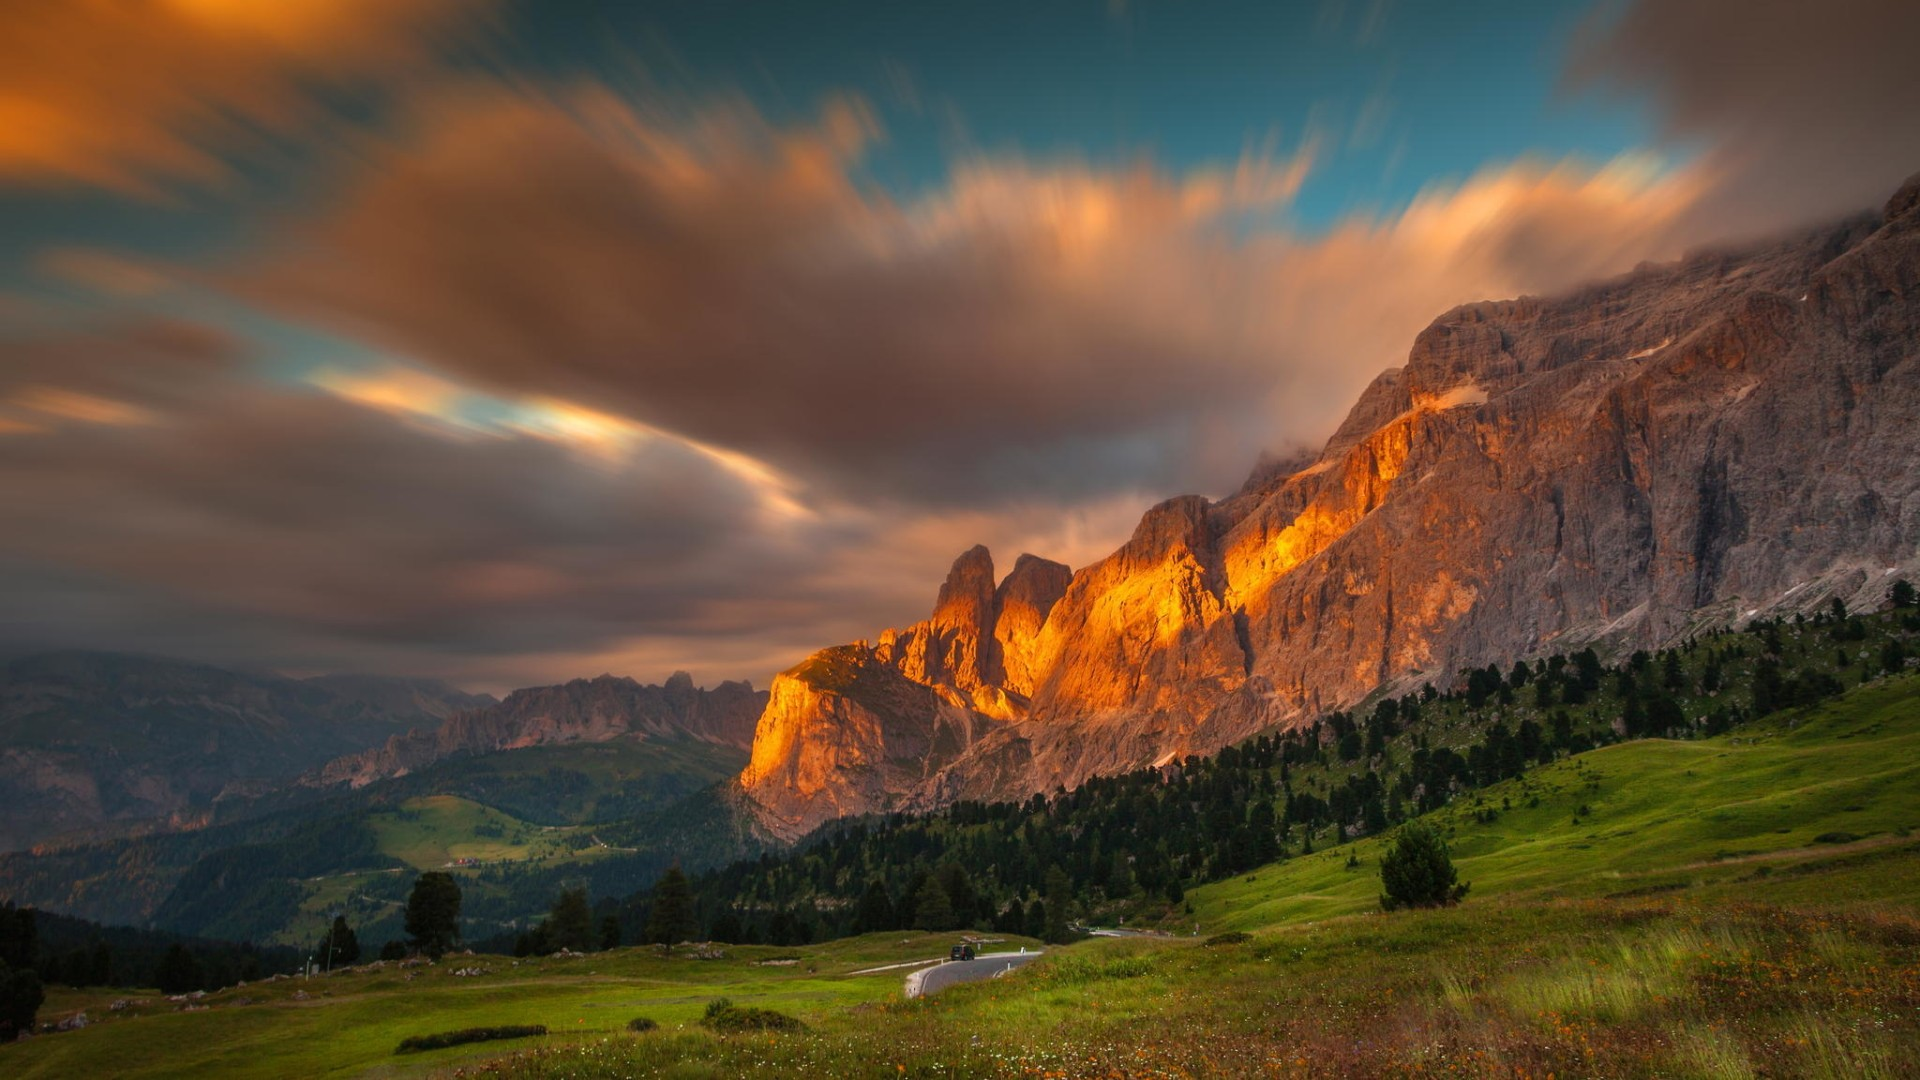 2560x1440 beautiful landscape 1440p resolution hd 4k for Landscape images